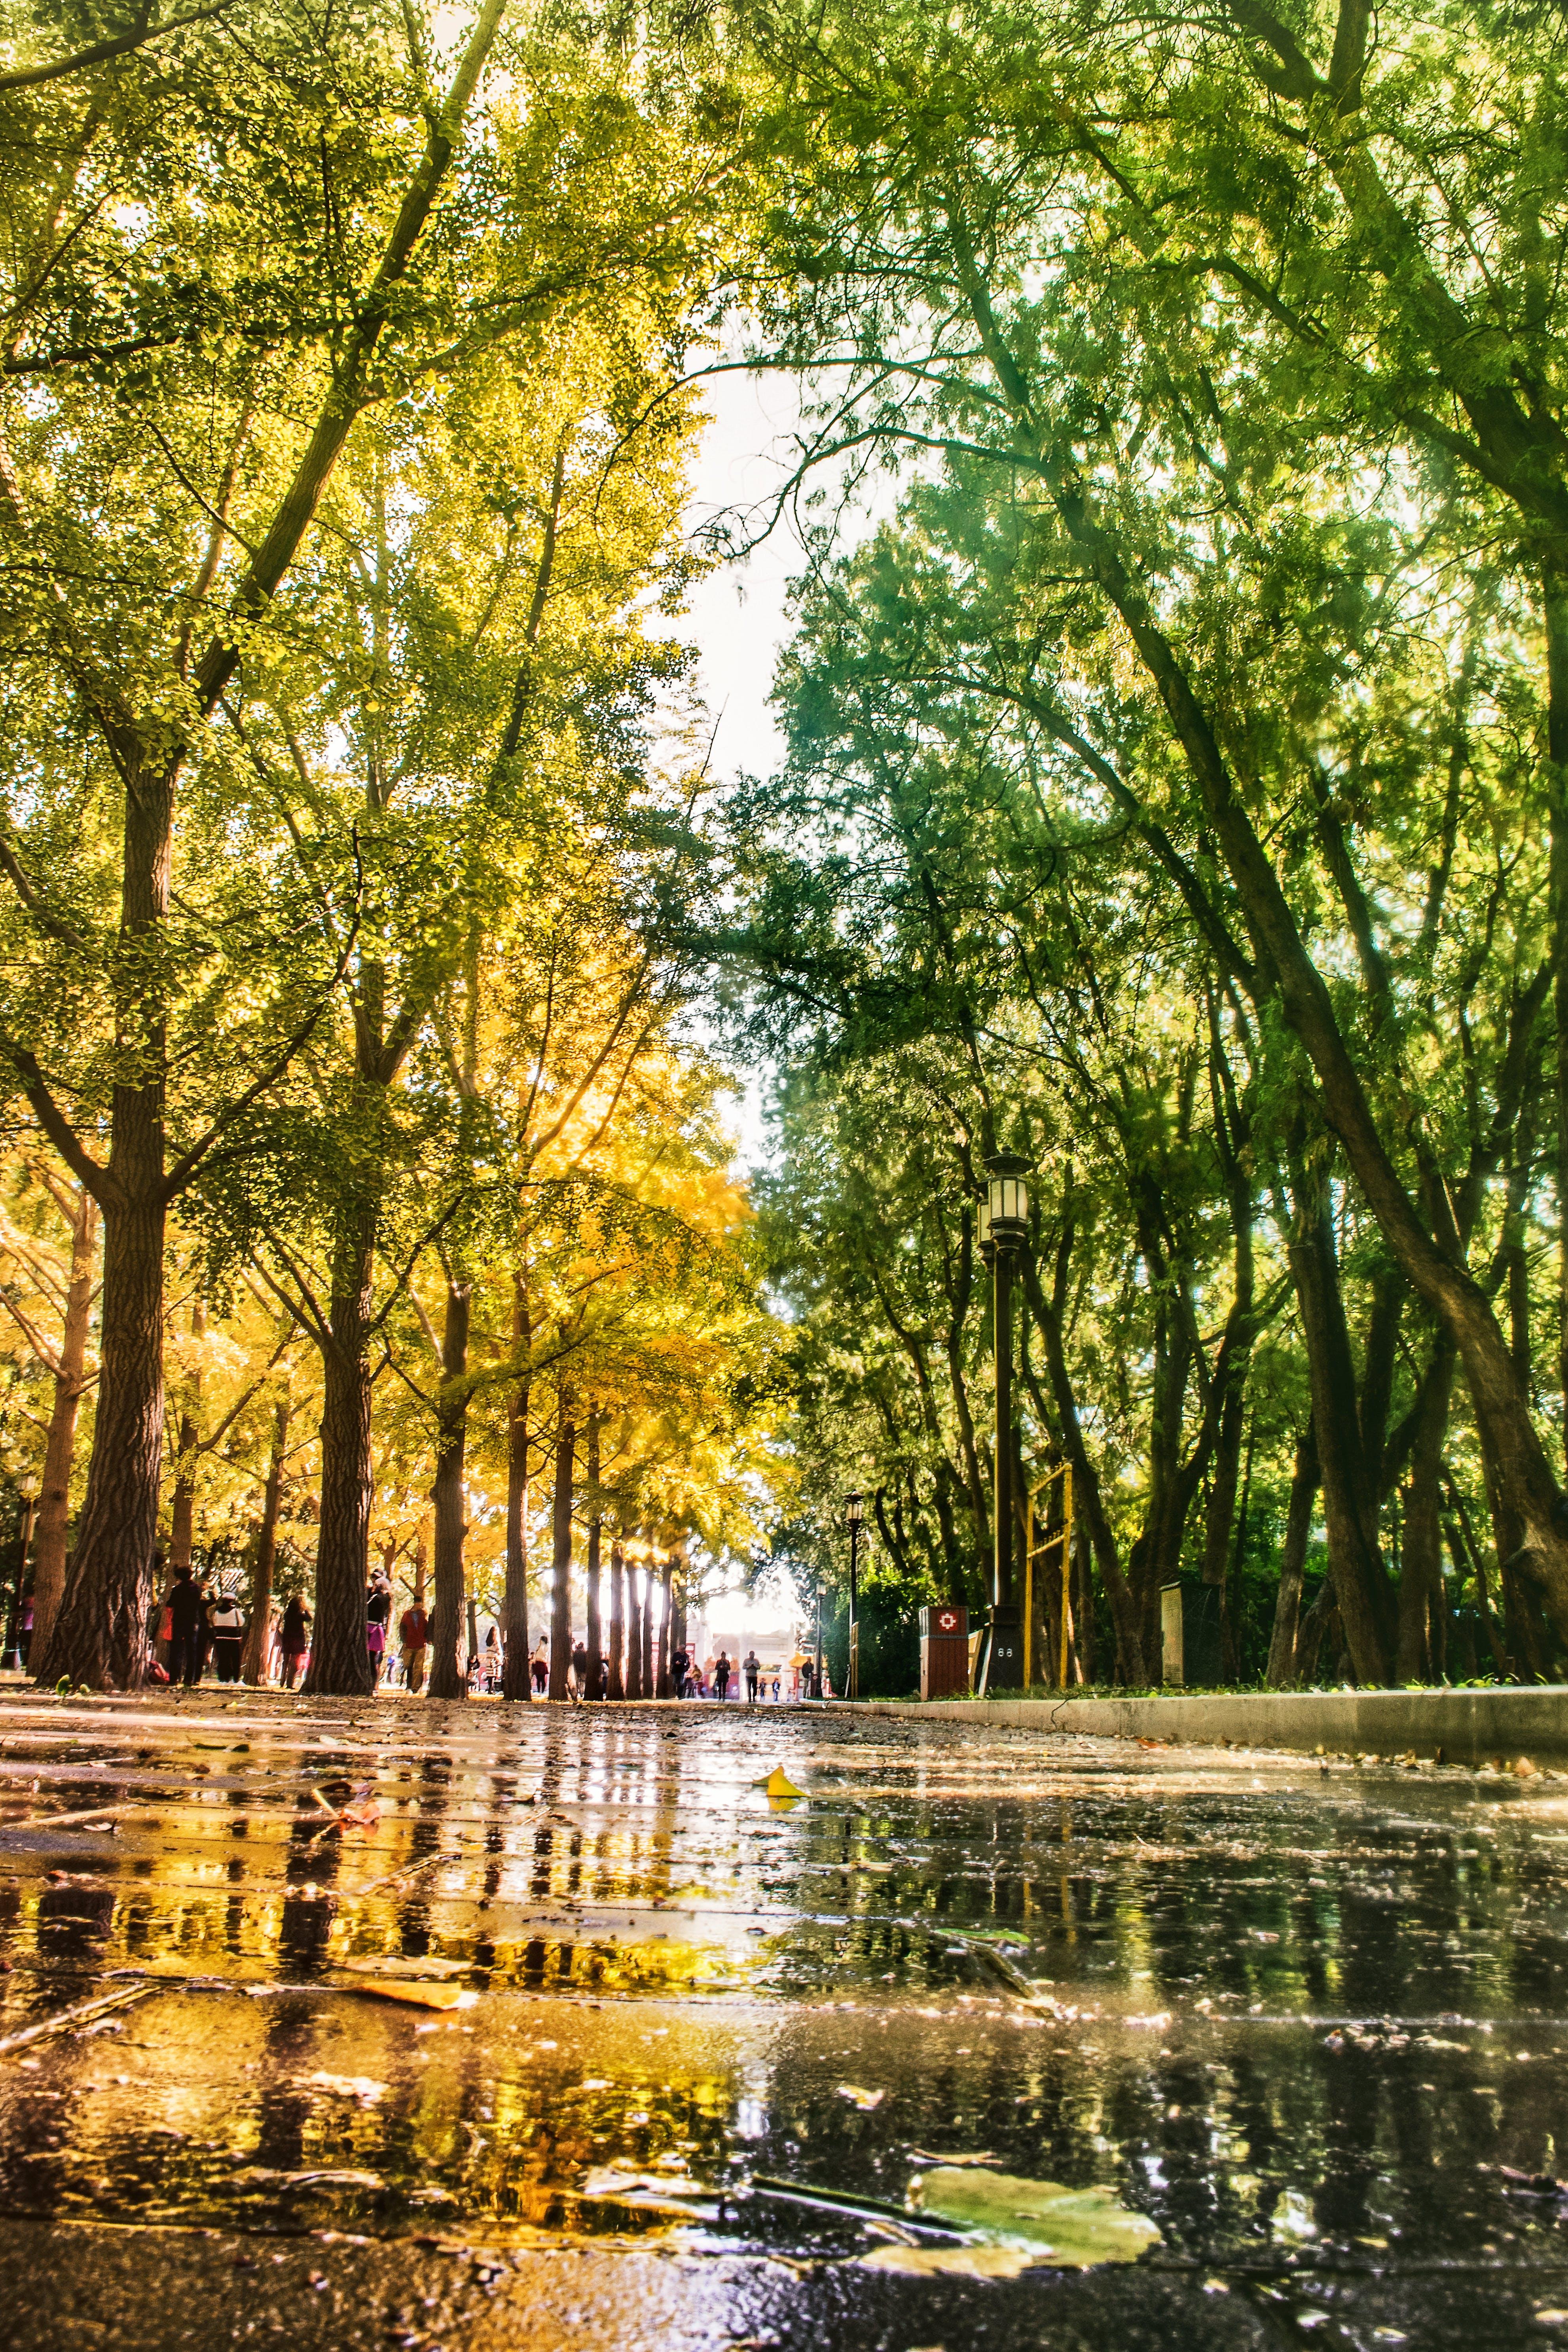 Free stock photo of 下雨, 倒影, 公园, 北京